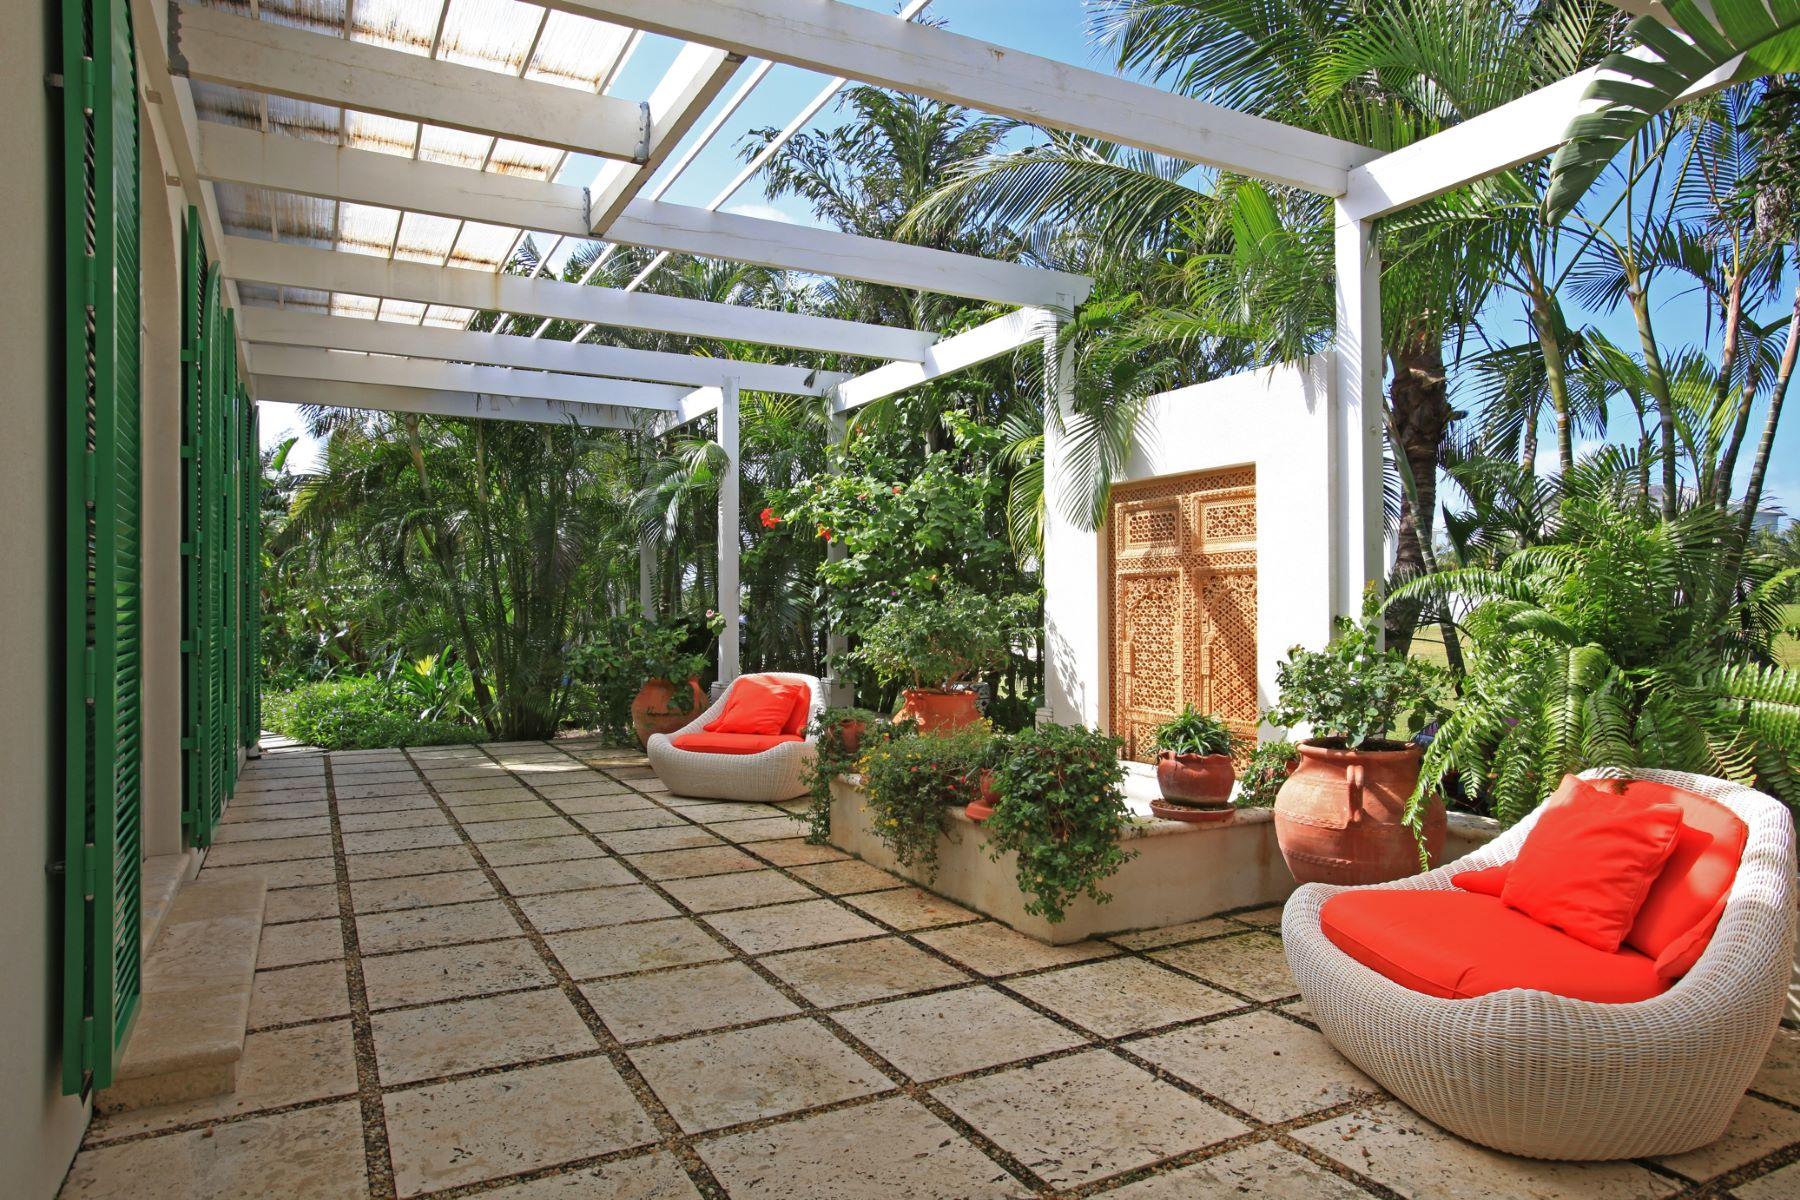 Additional photo for property listing at Cascarilla, Ocean Club Estates Ocean Club Estates, Paradise Island, Nassau And Paradise Island Bahamas